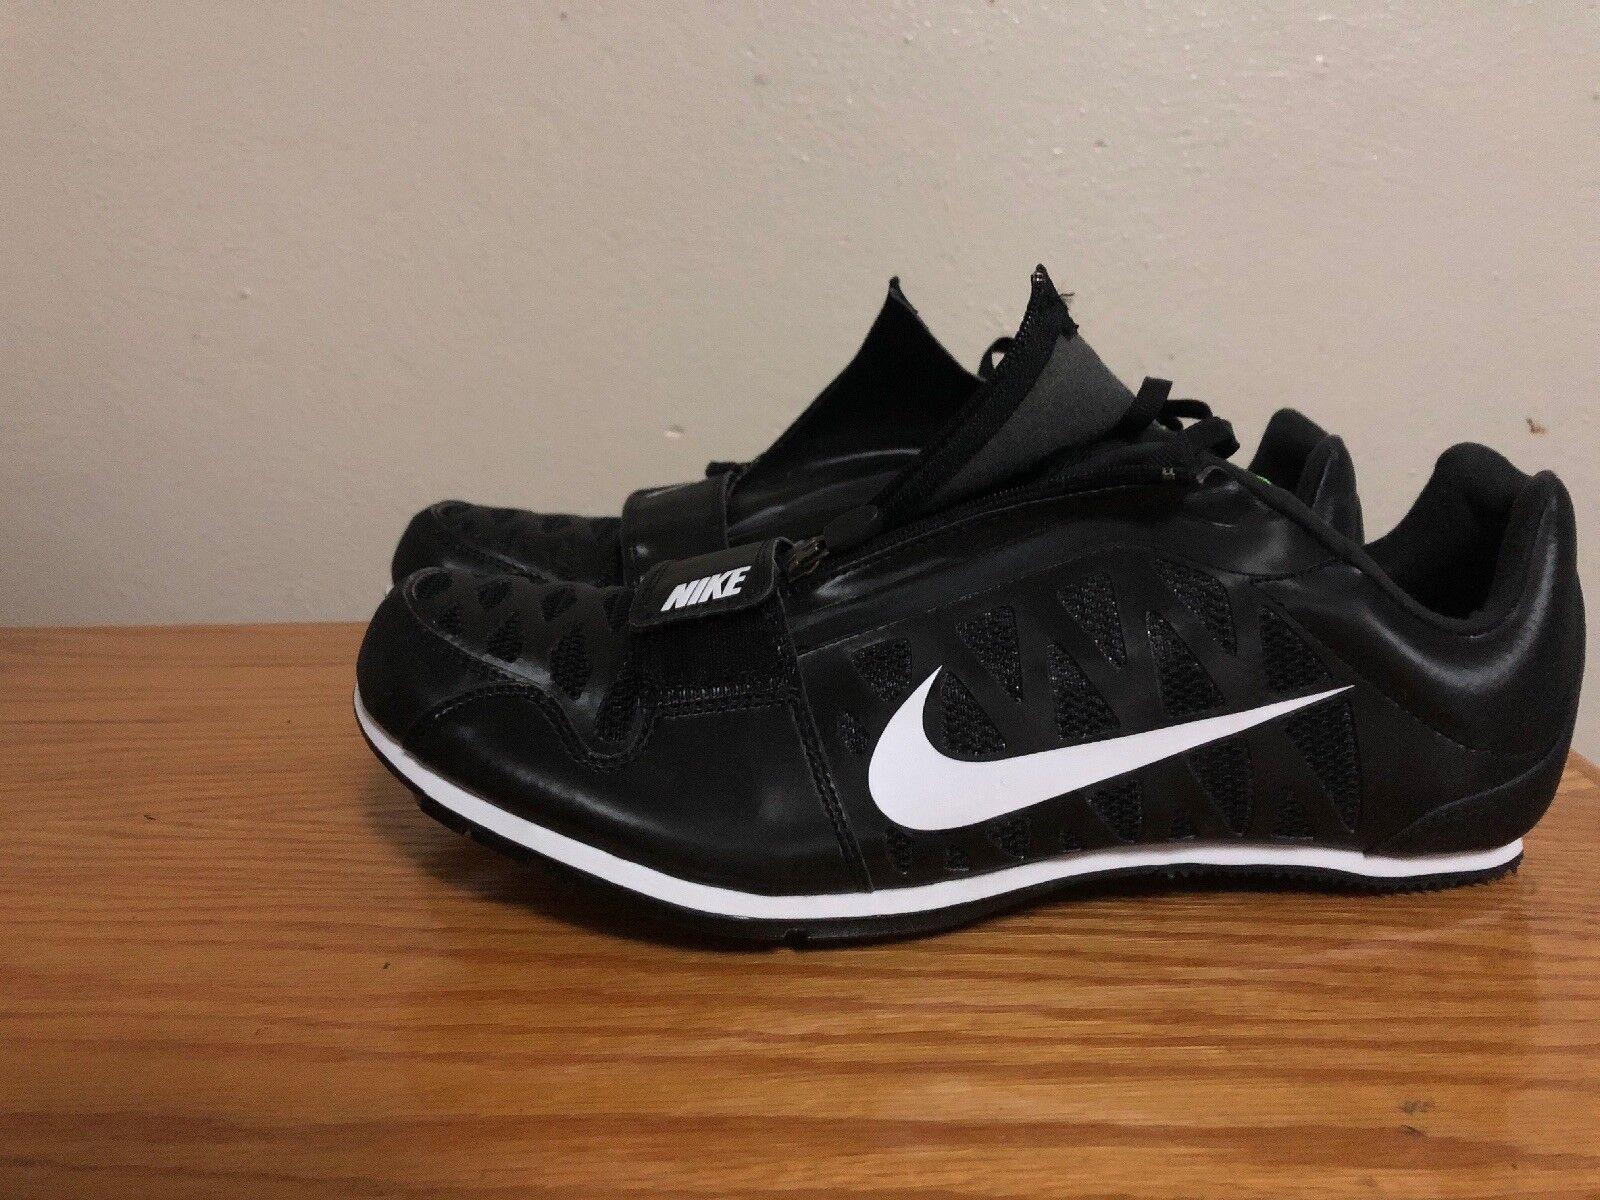 Nike Zoom Long Jump 4 Track Spikes 415339-017 Men's Size 7 Black White